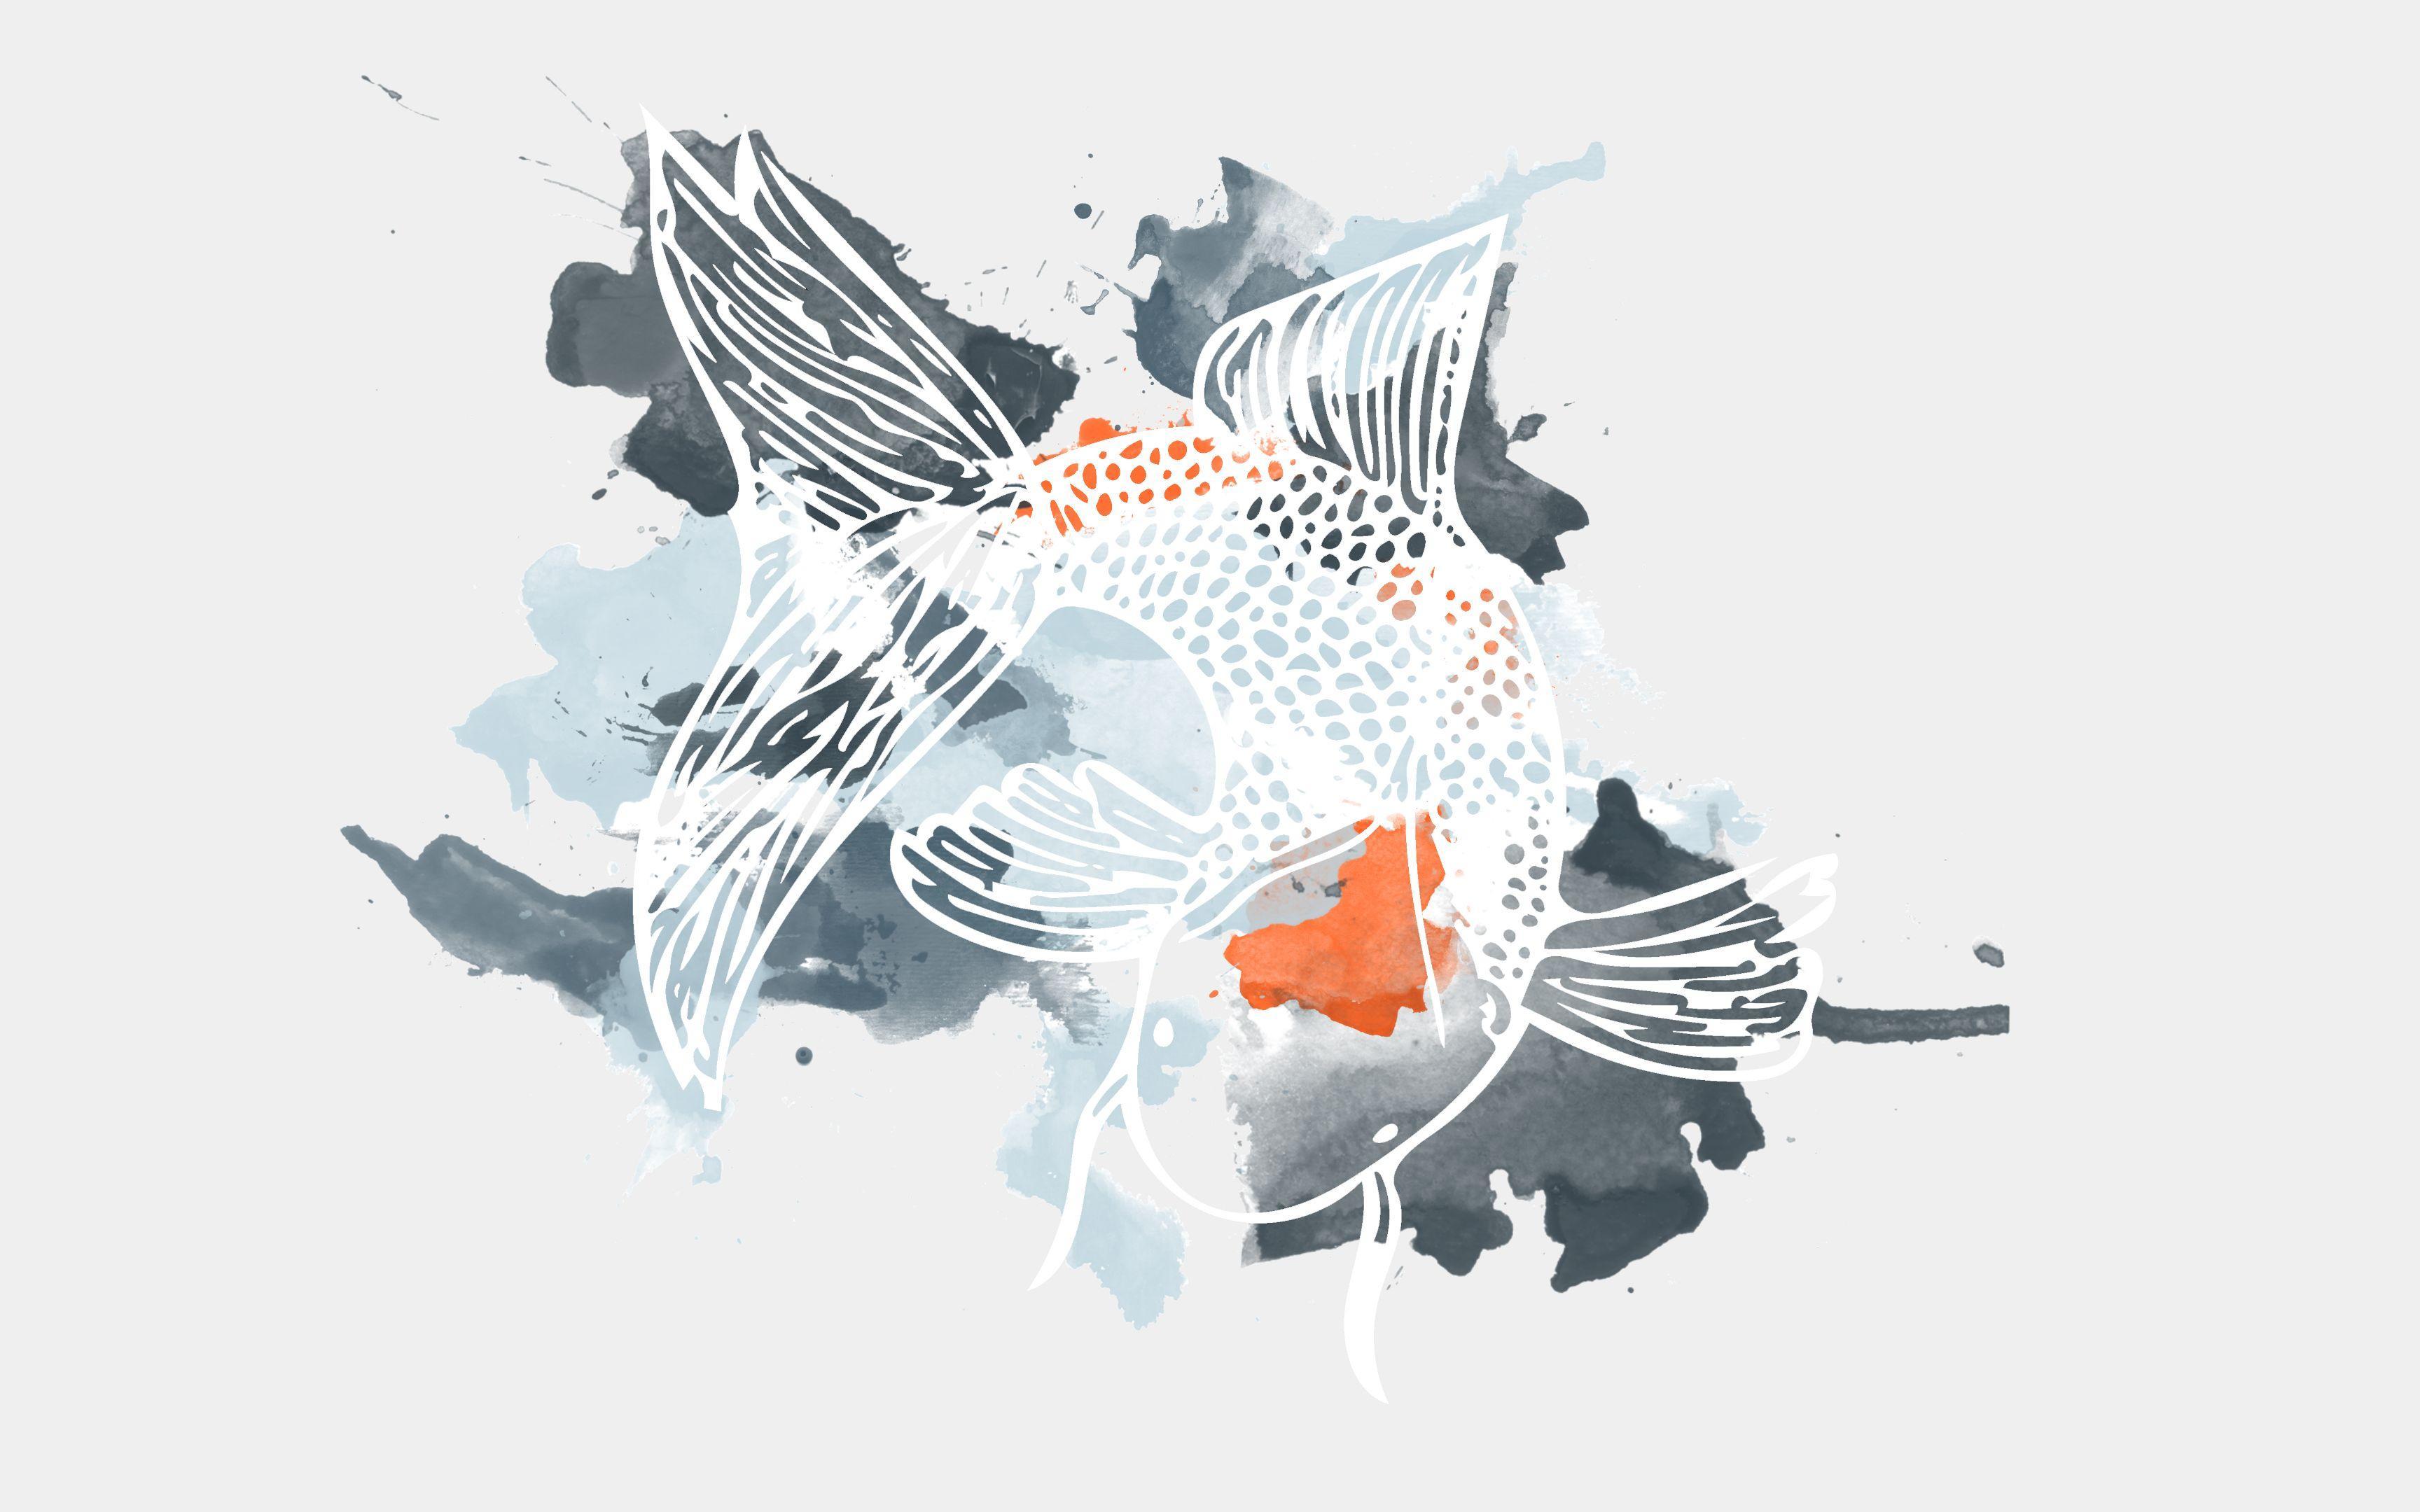 Koi Fish Art Wallpapers Top Free Koi Fish Art Backgrounds